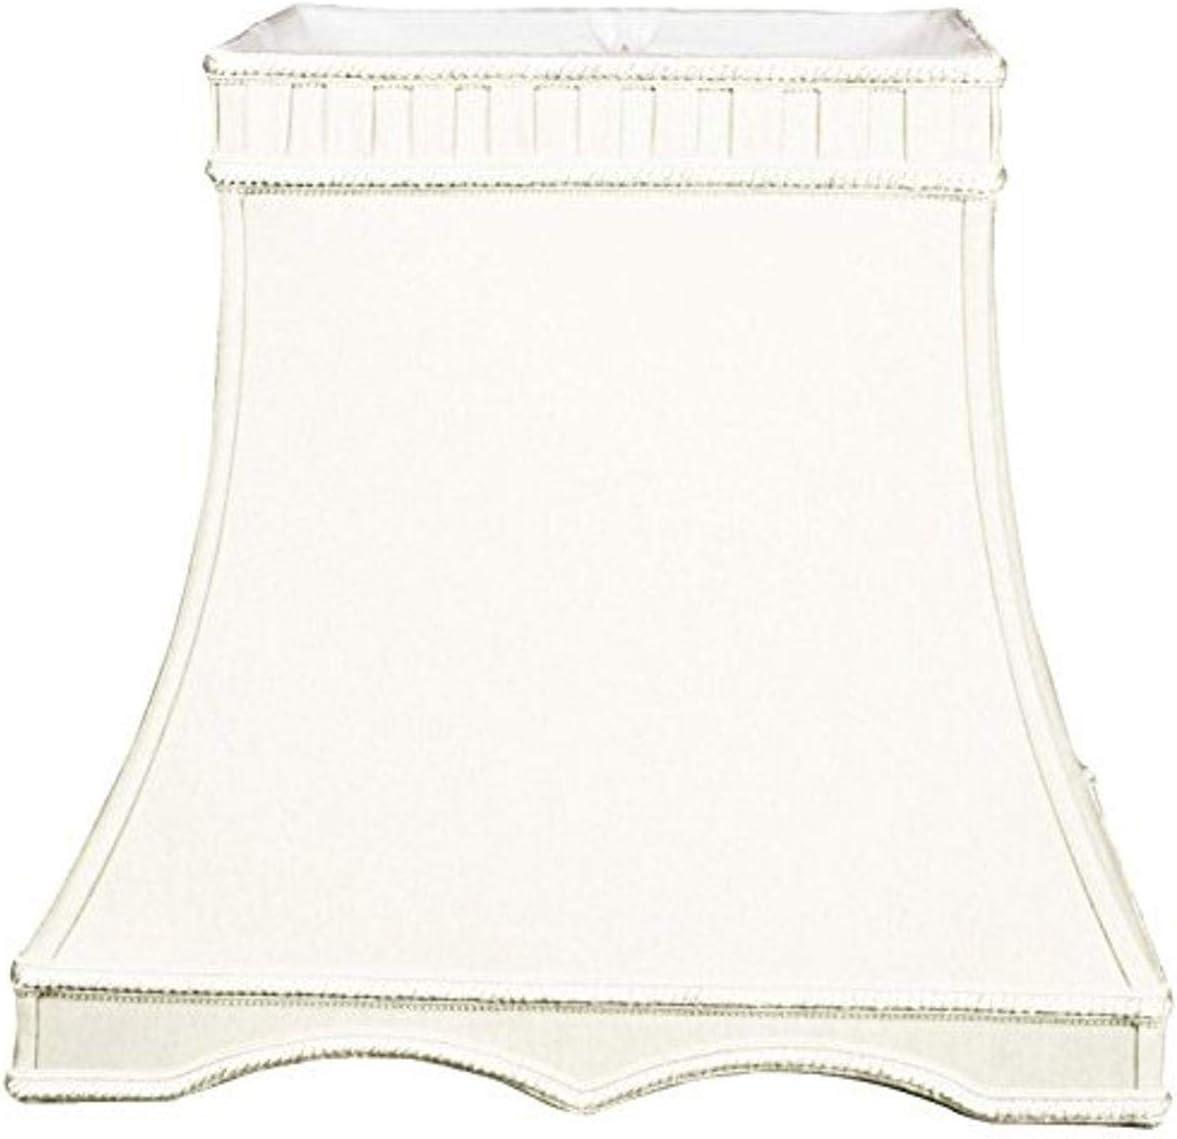 Royal Designs Rectangle Gallery Designer Lamp Shade, White, 11 x 9 x 16 x 11 x 13.5